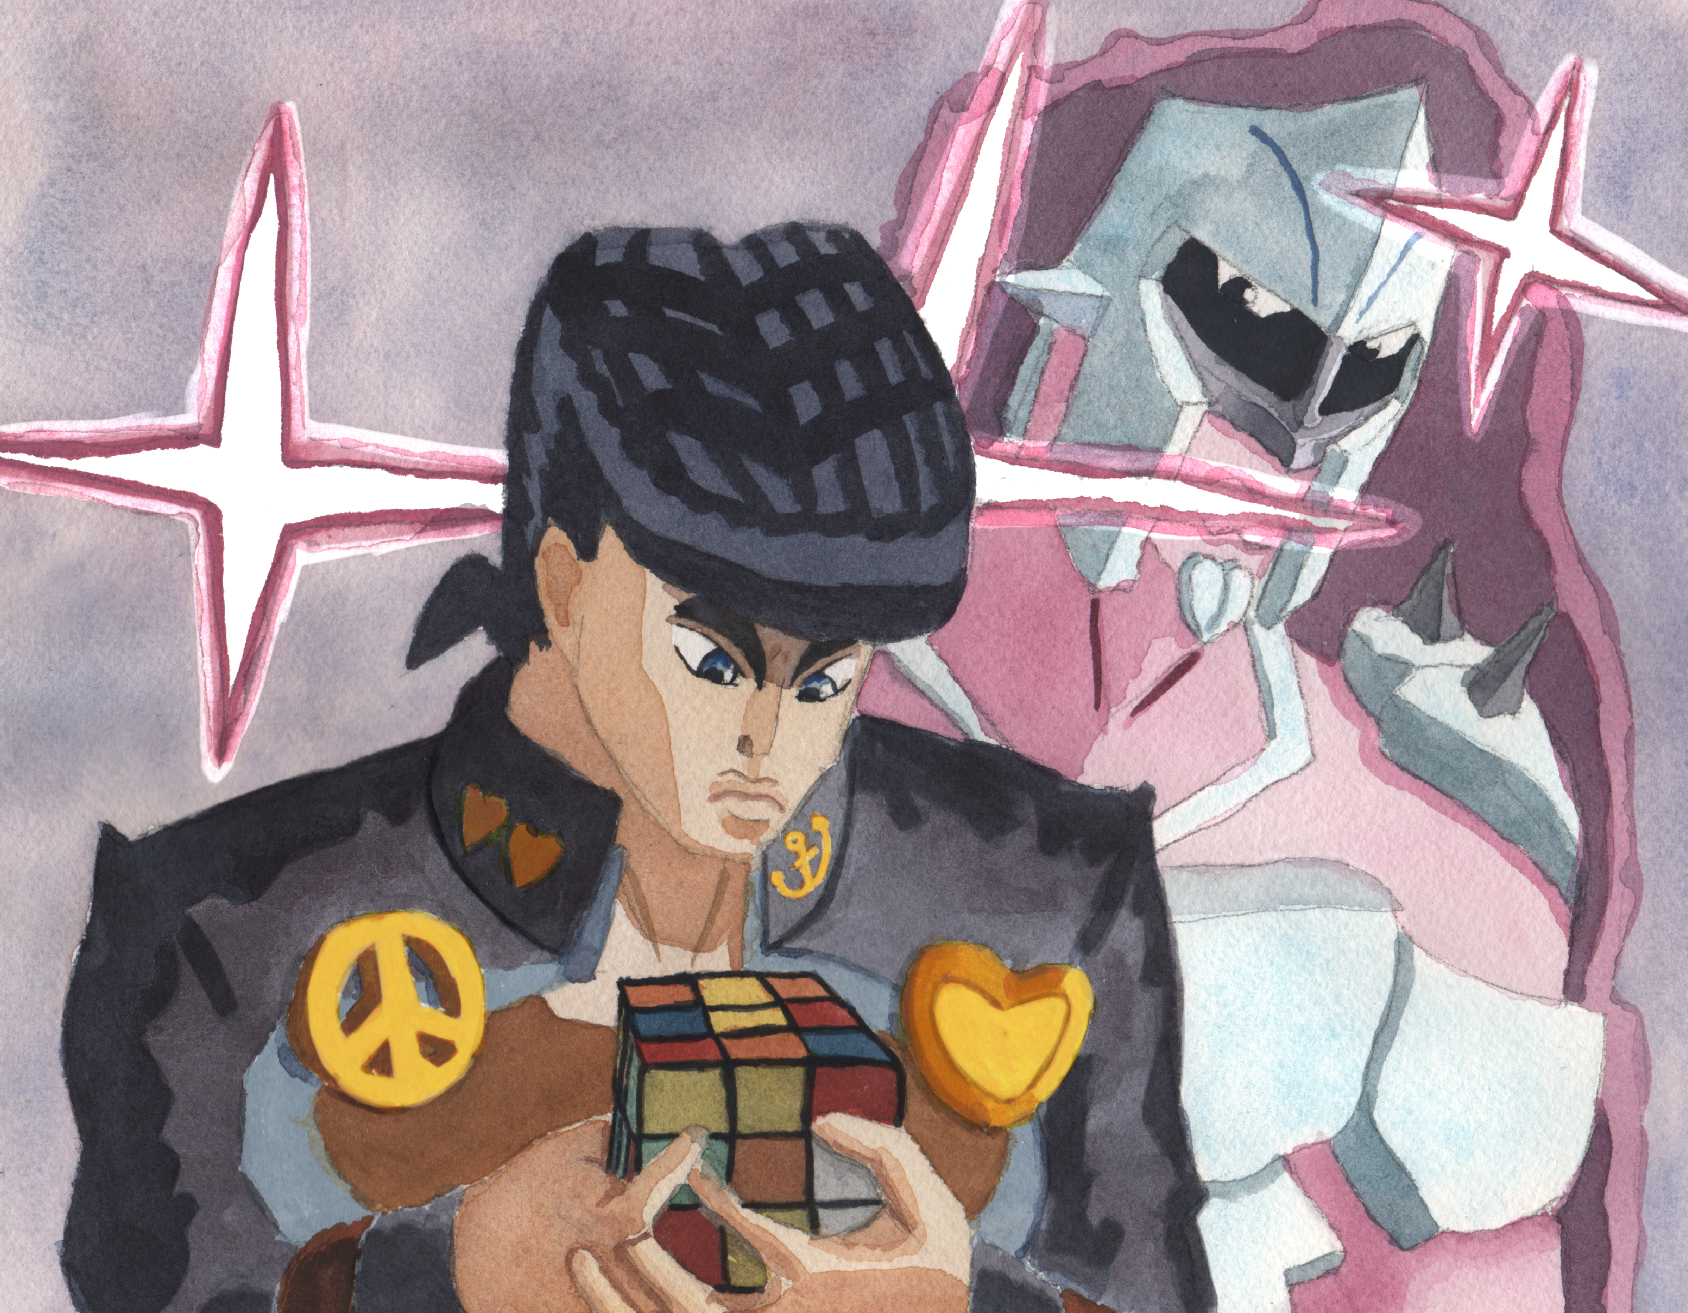 Josuke Higashikata and Crazy Diamond with a Rubik's Cube (Jojo's Bizarre Adventure)